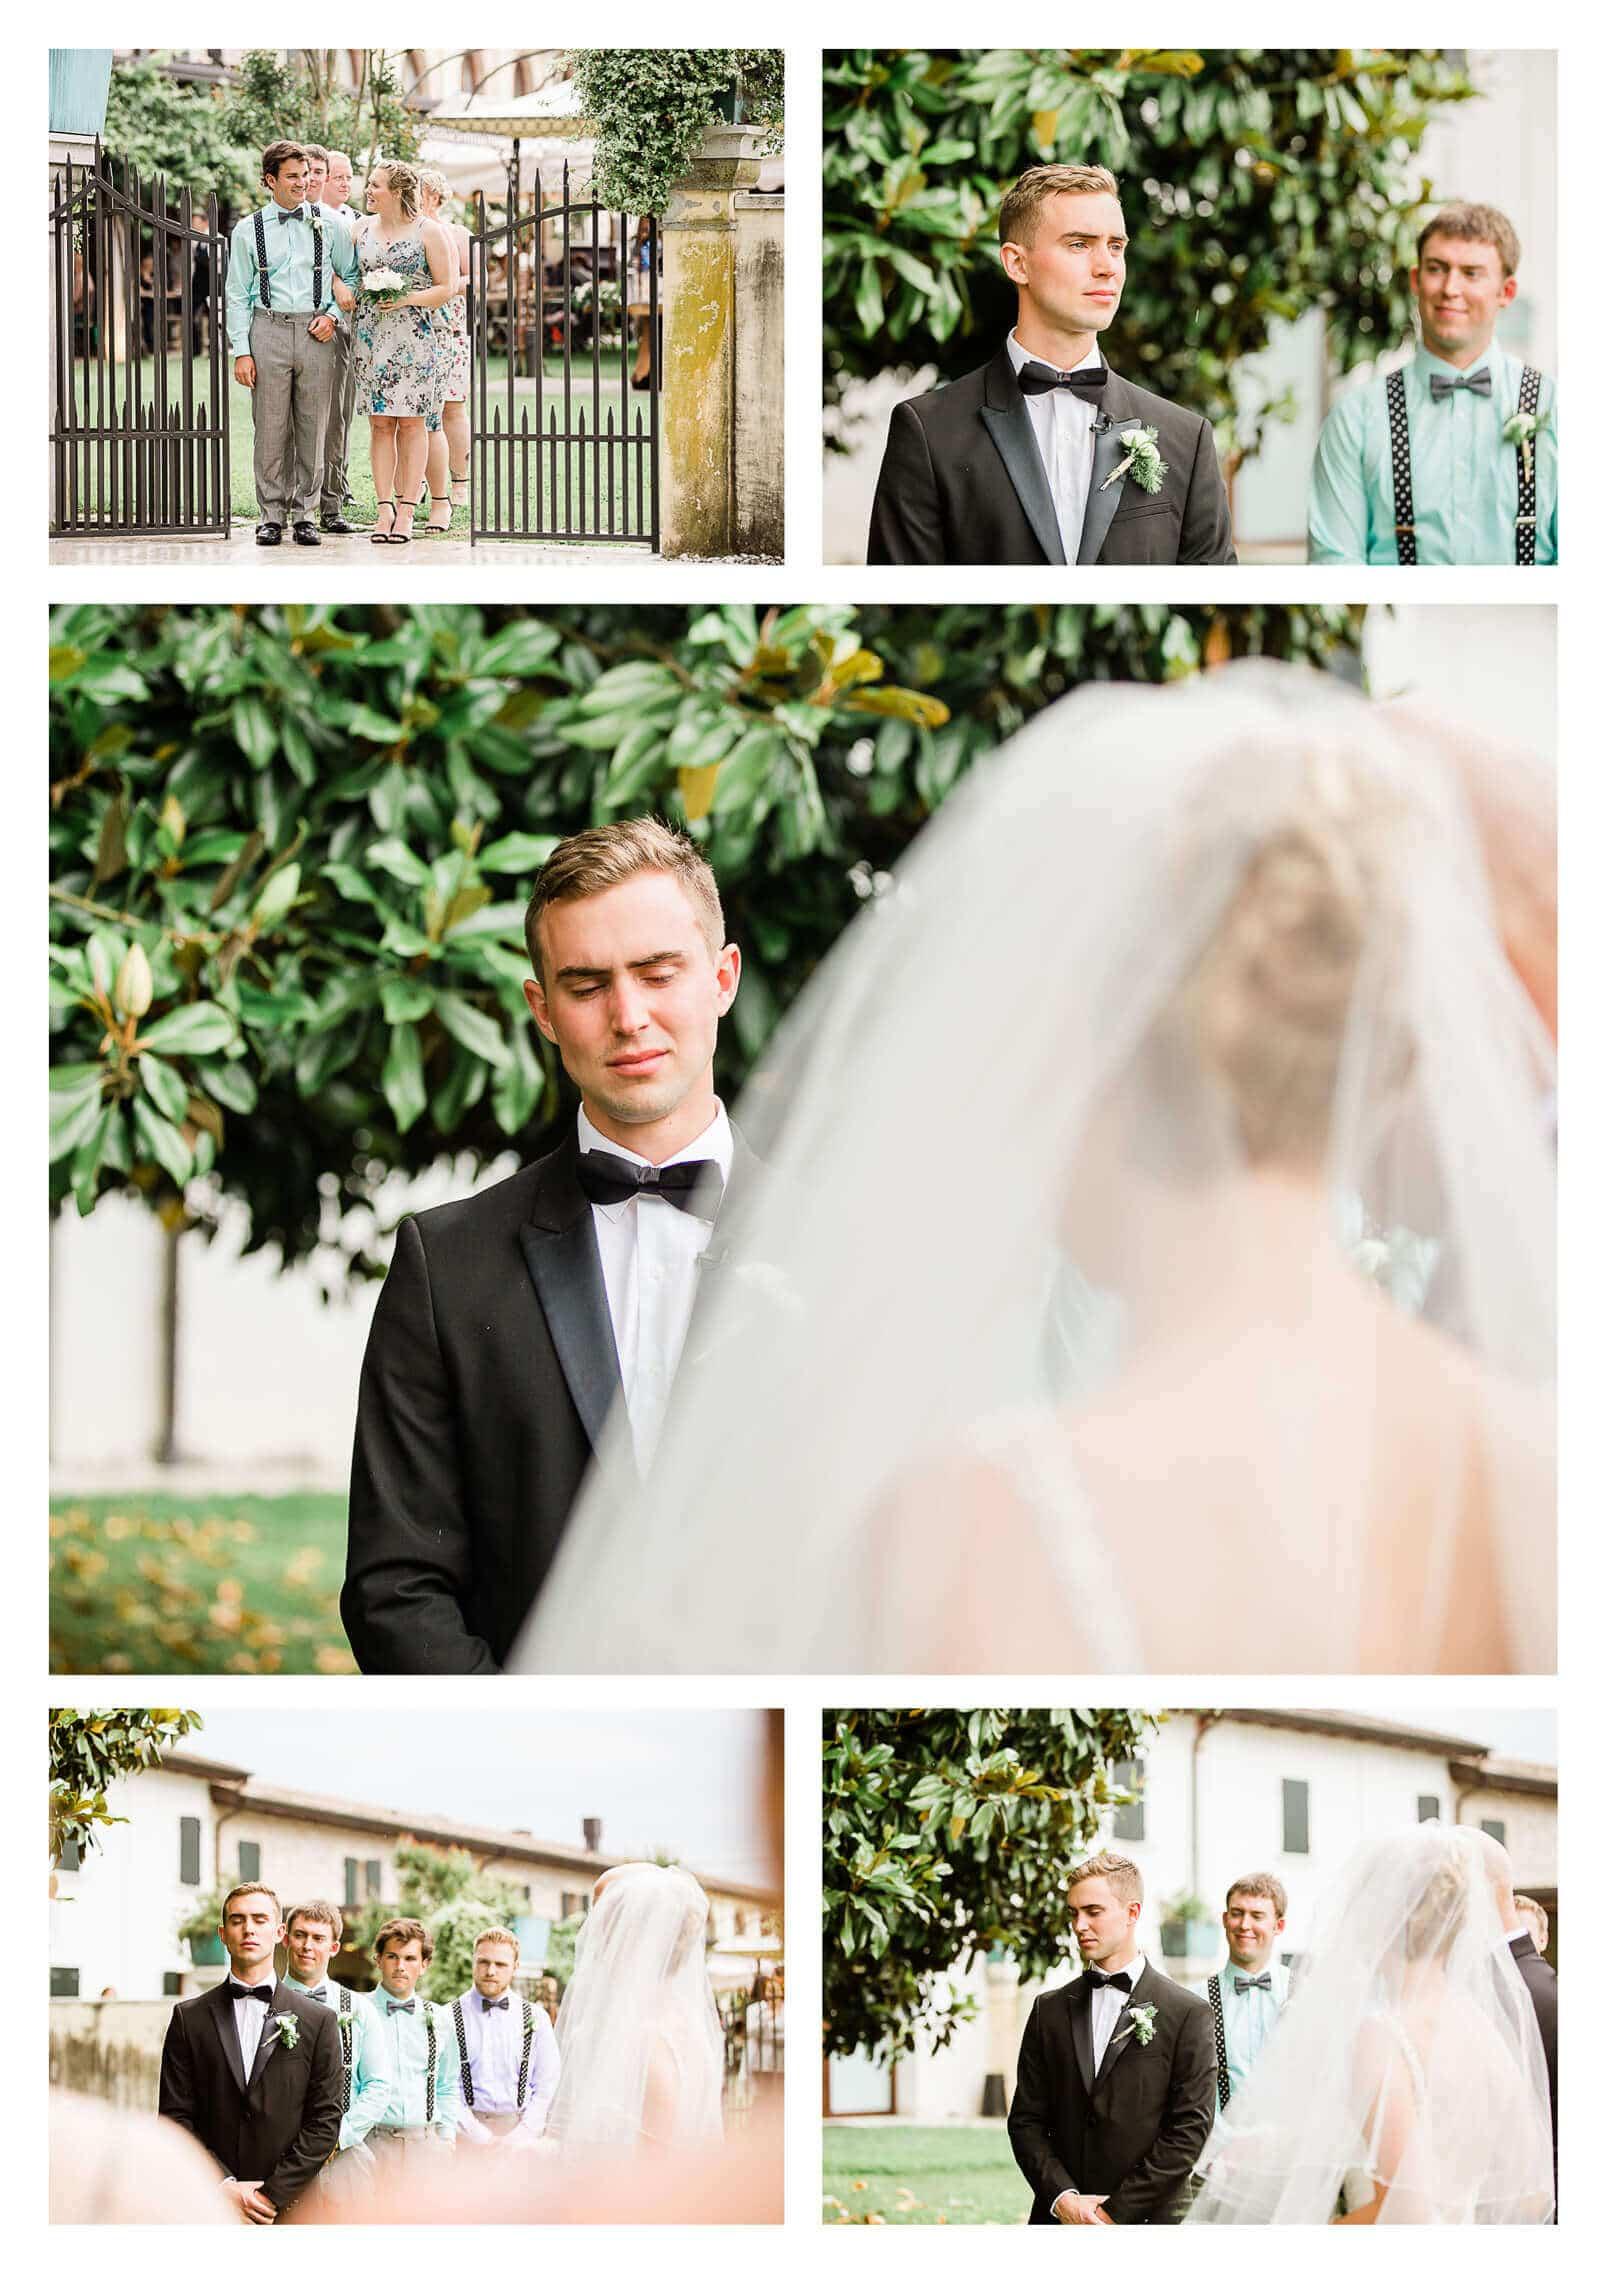 Groom emotional reaction when bride walks down the aisle | Italy wedding photographer-